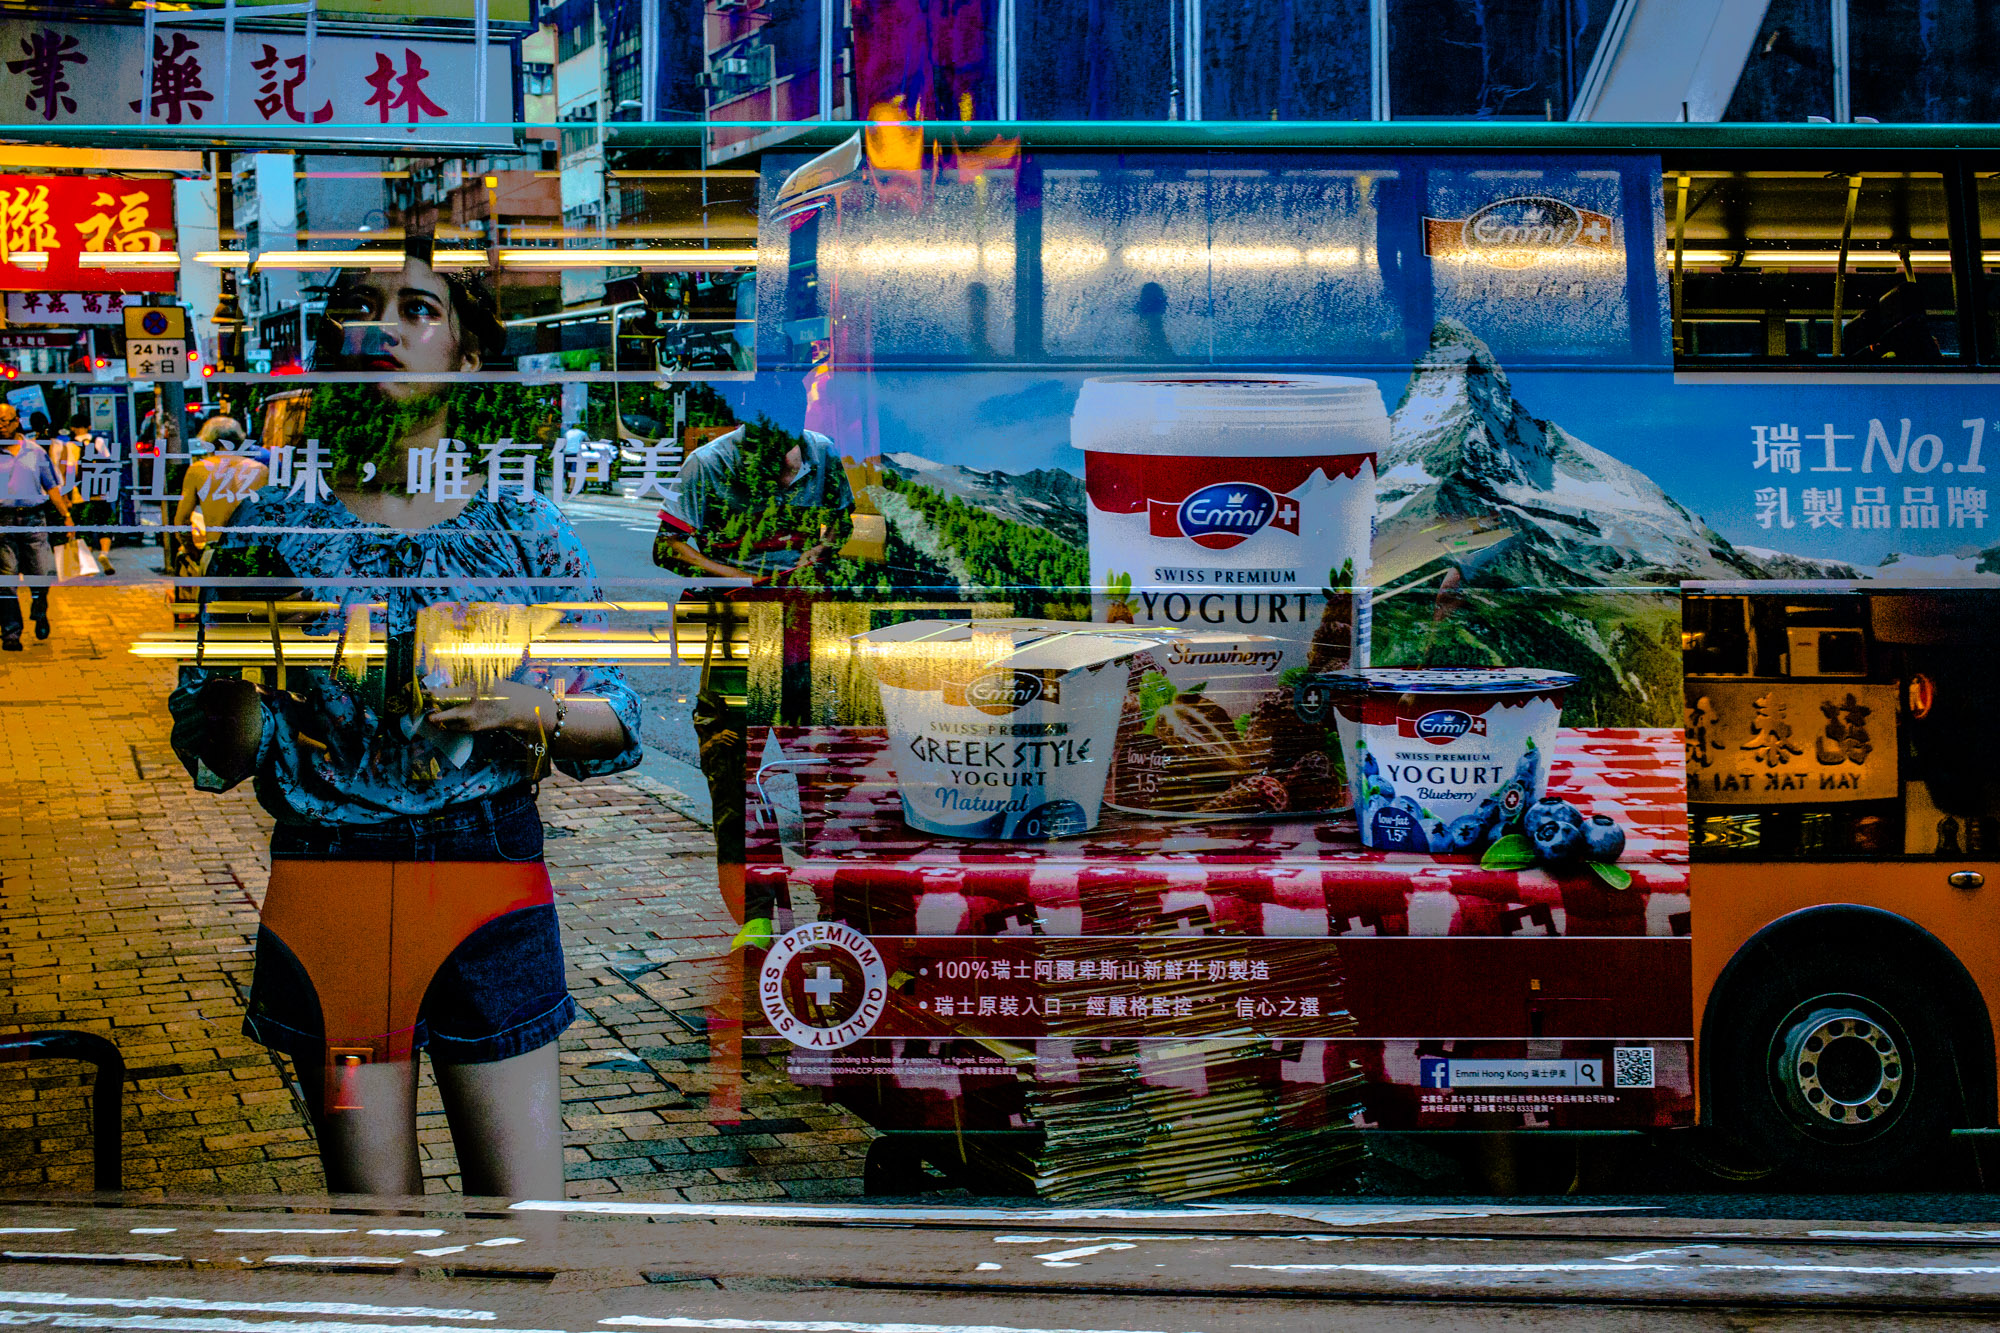 Ellen_Friedlander_Hong Kong Multiple Exposure_2017 -0084.jpg